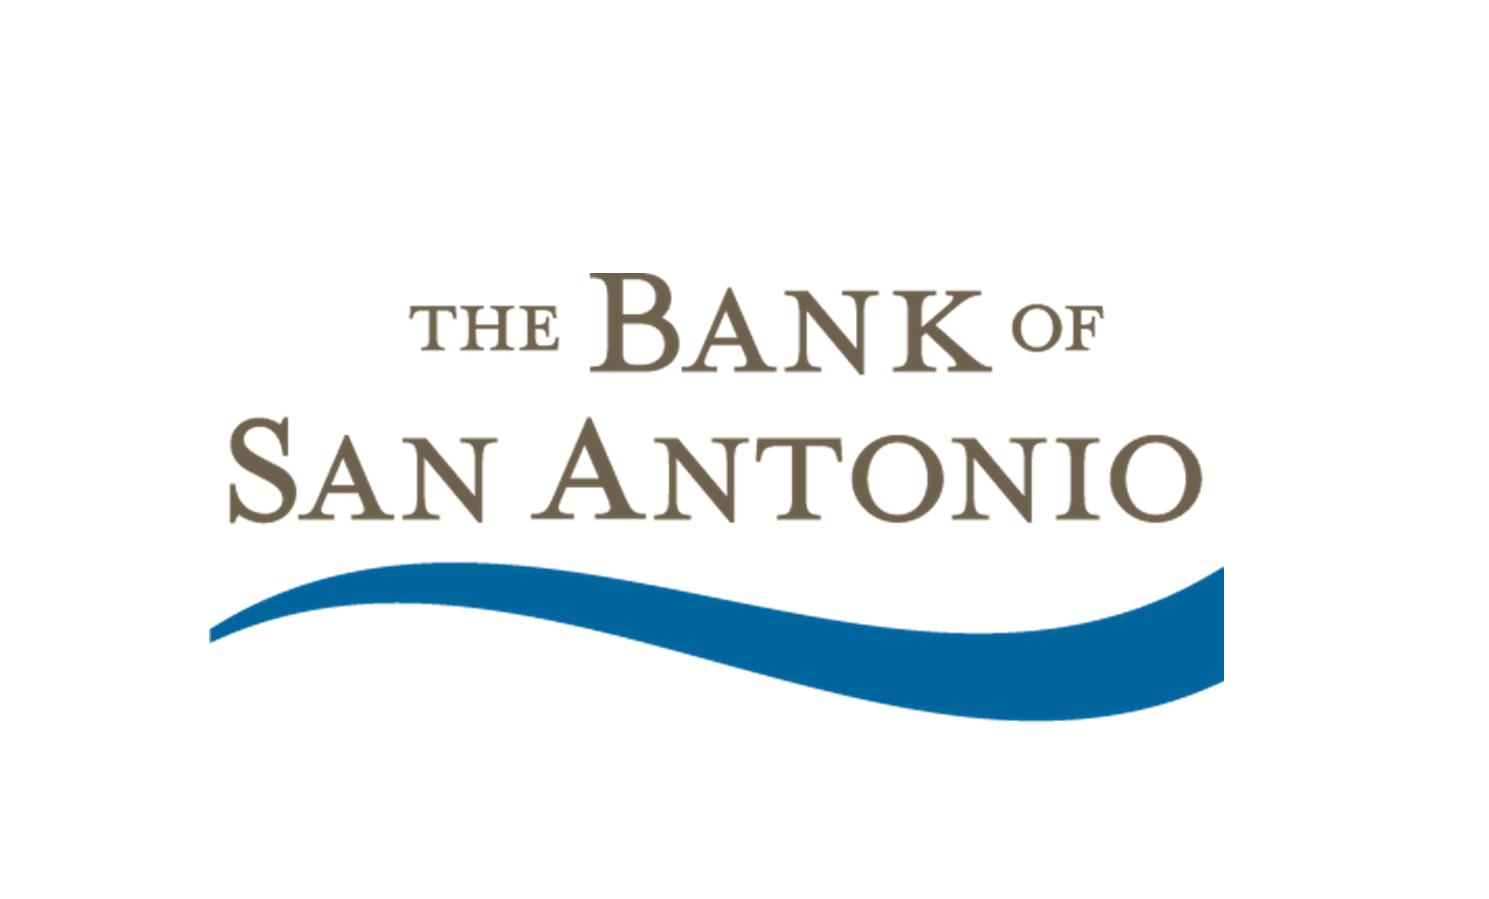 bank-of-sa-logo-with-white-framing-w1489.png